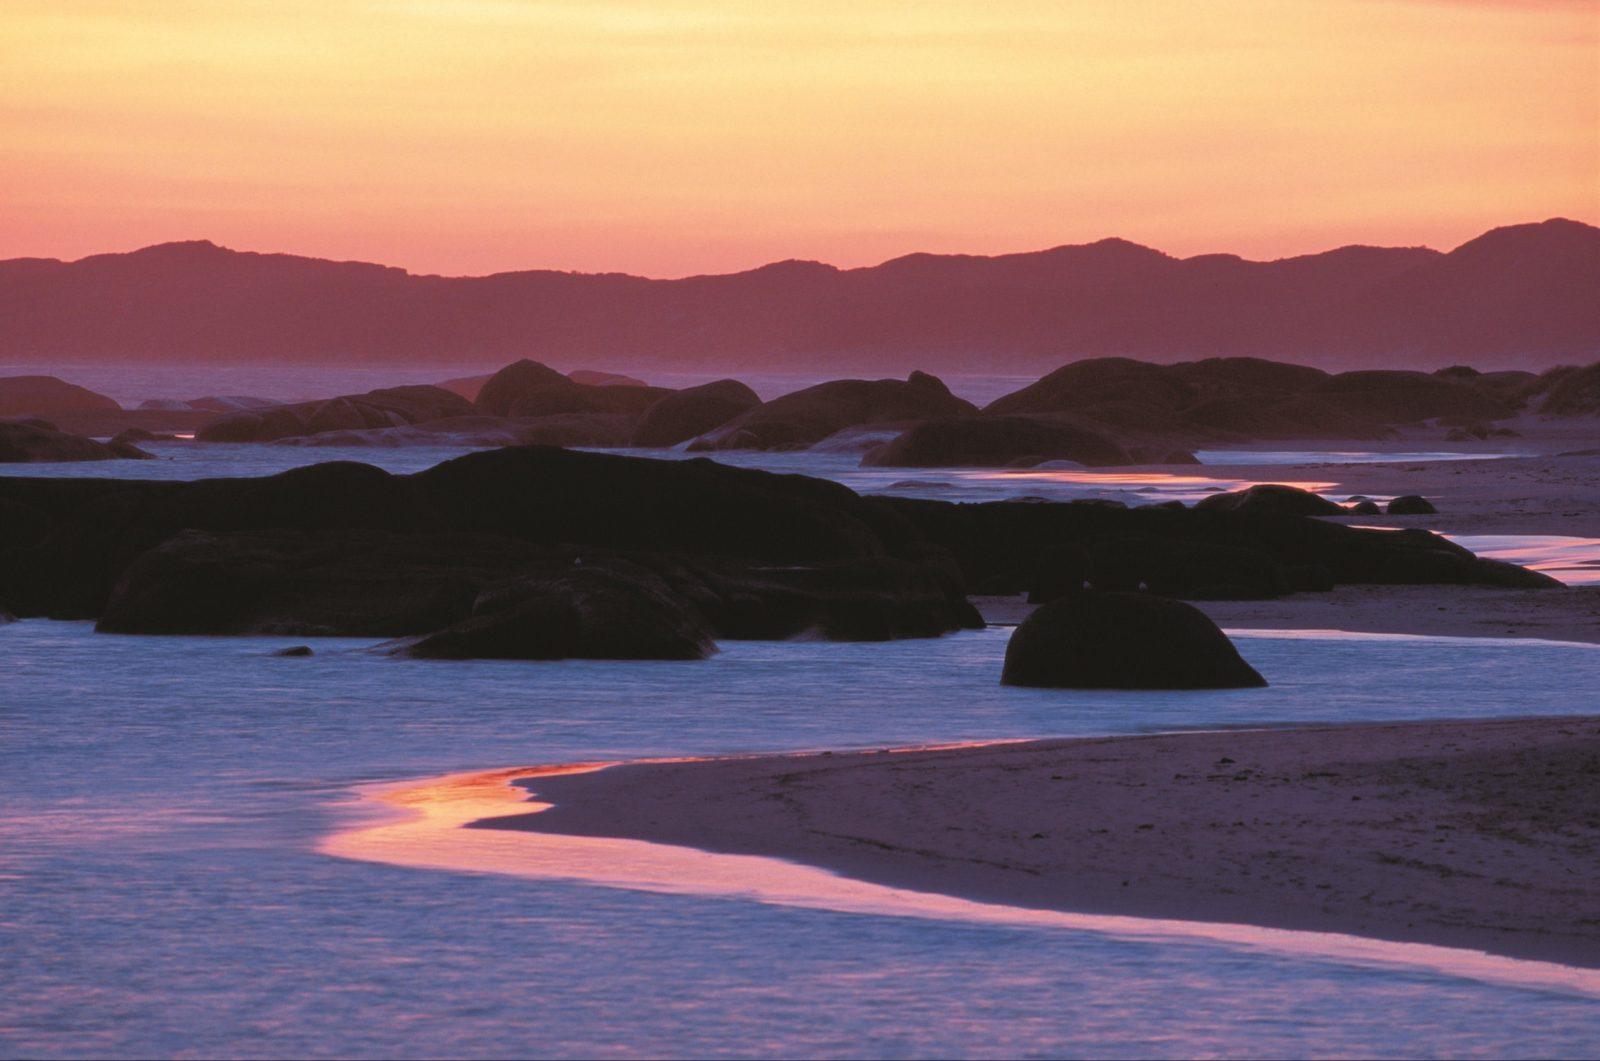 William Bay National Park, Denmark, Western Australia